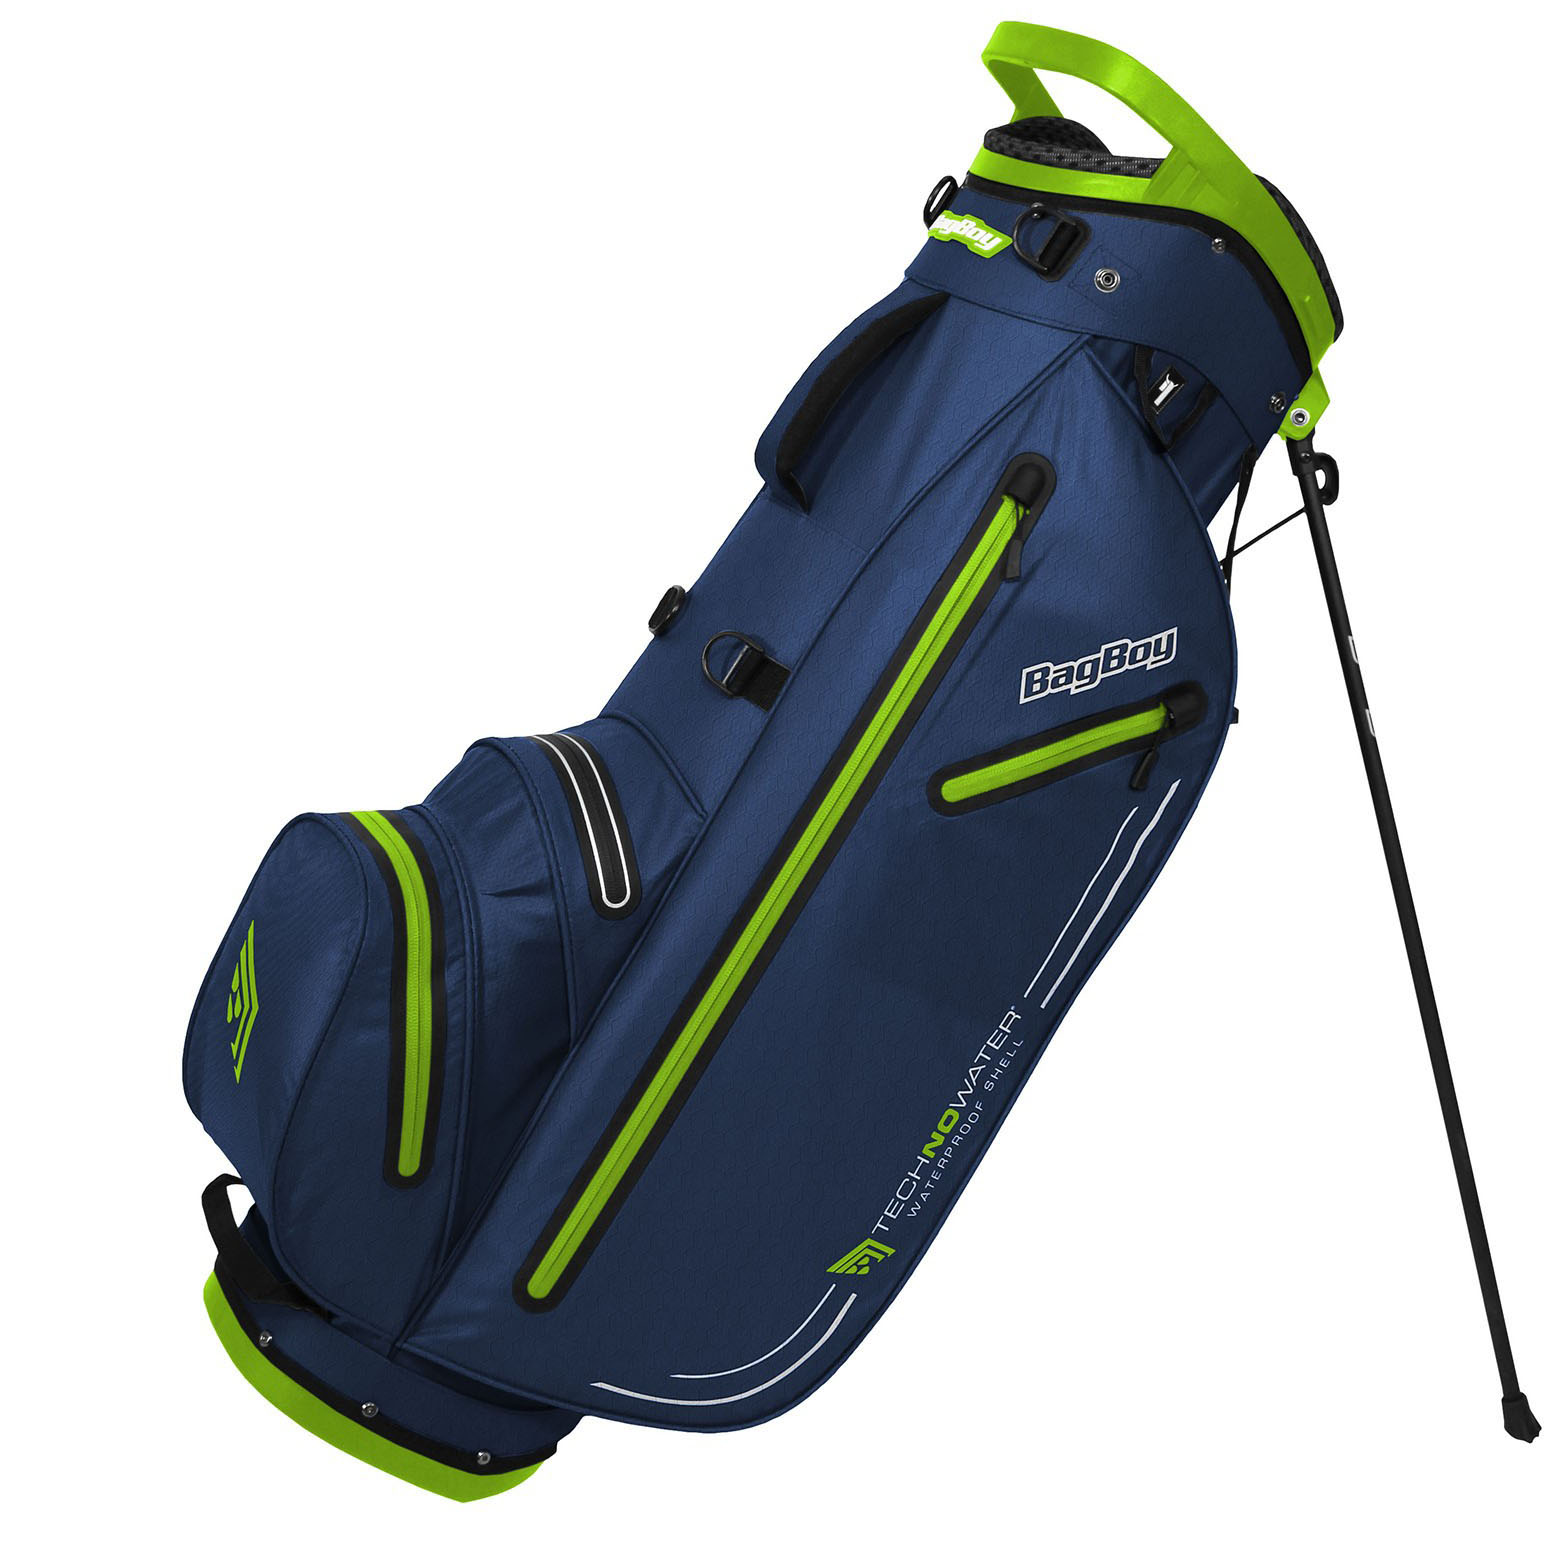 BagBoy Technowater Trekker Dri Golf Stand Bag – Navy/Lime